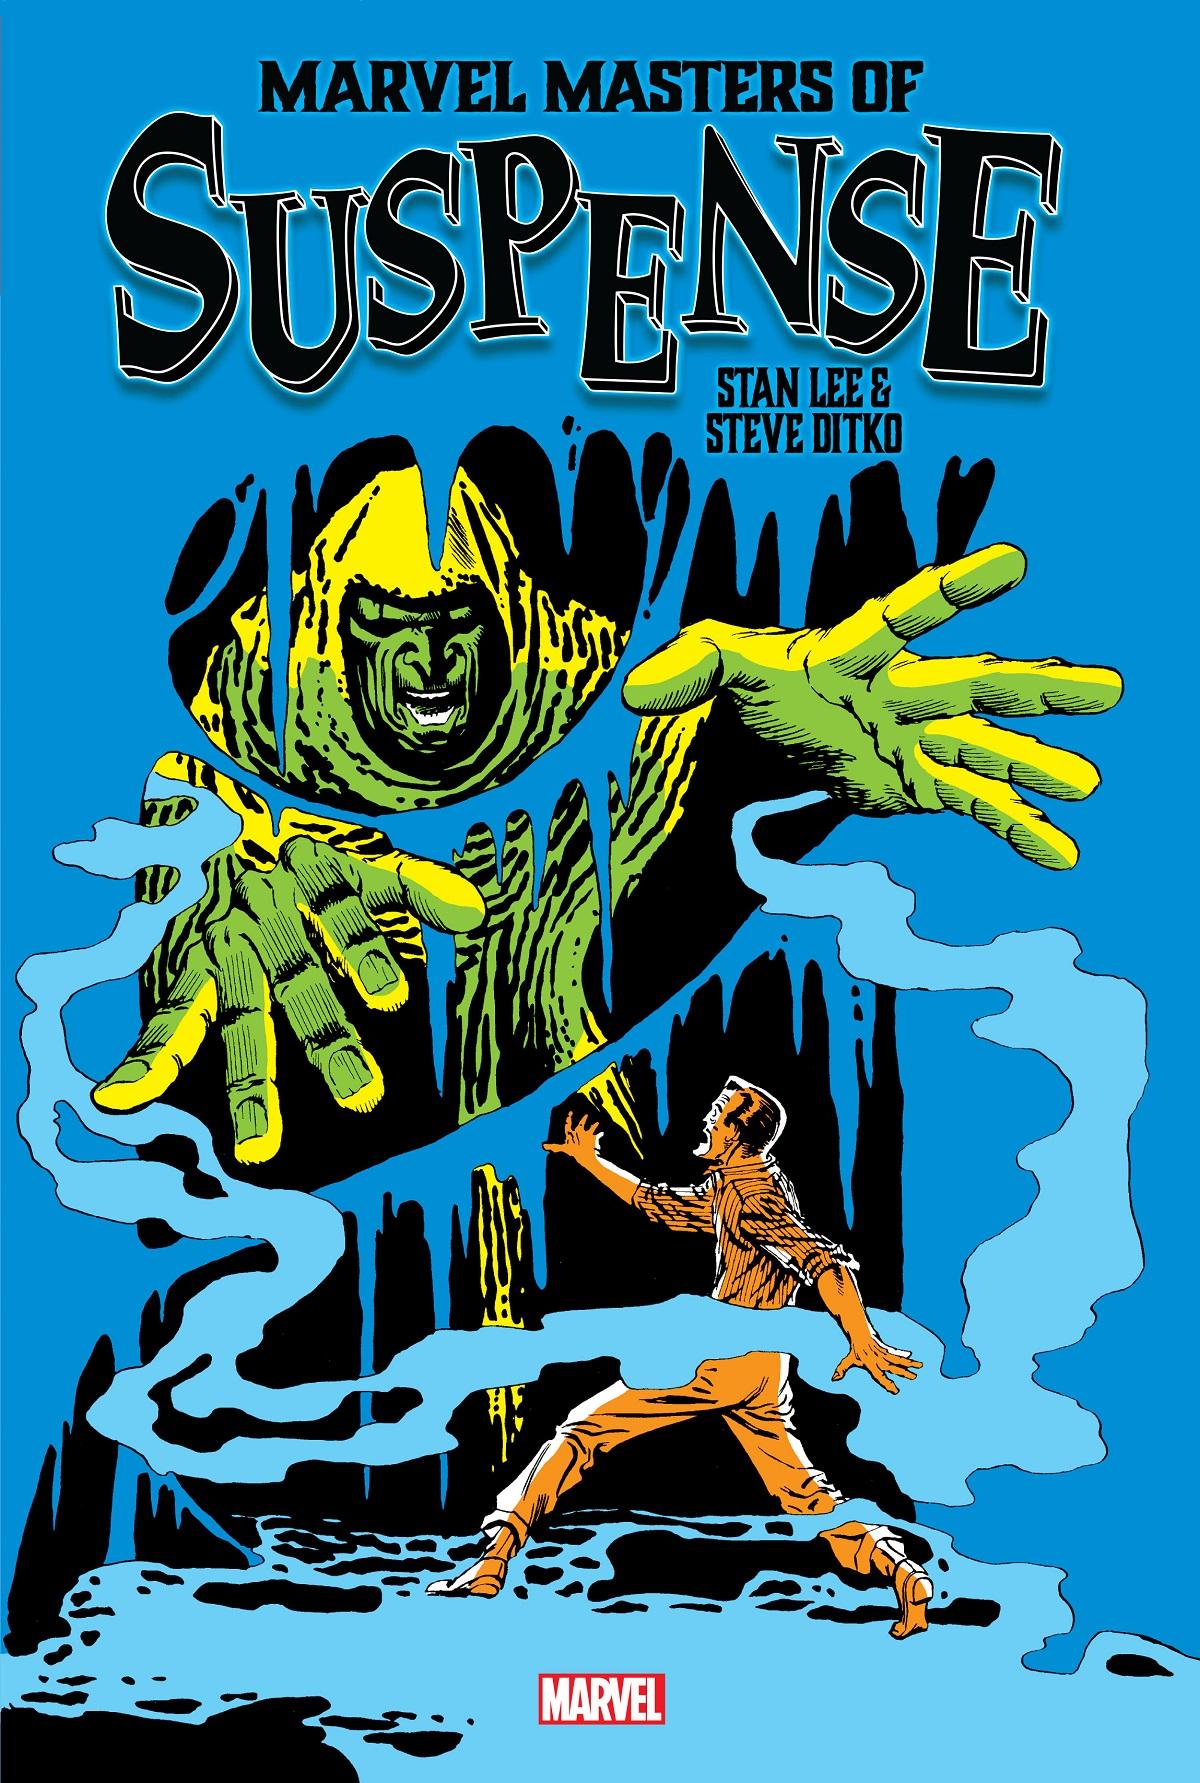 Marvel Masters Of Suspense: Stan Lee & Steve Ditko Omnibus Vol. 1 (Hardcover)